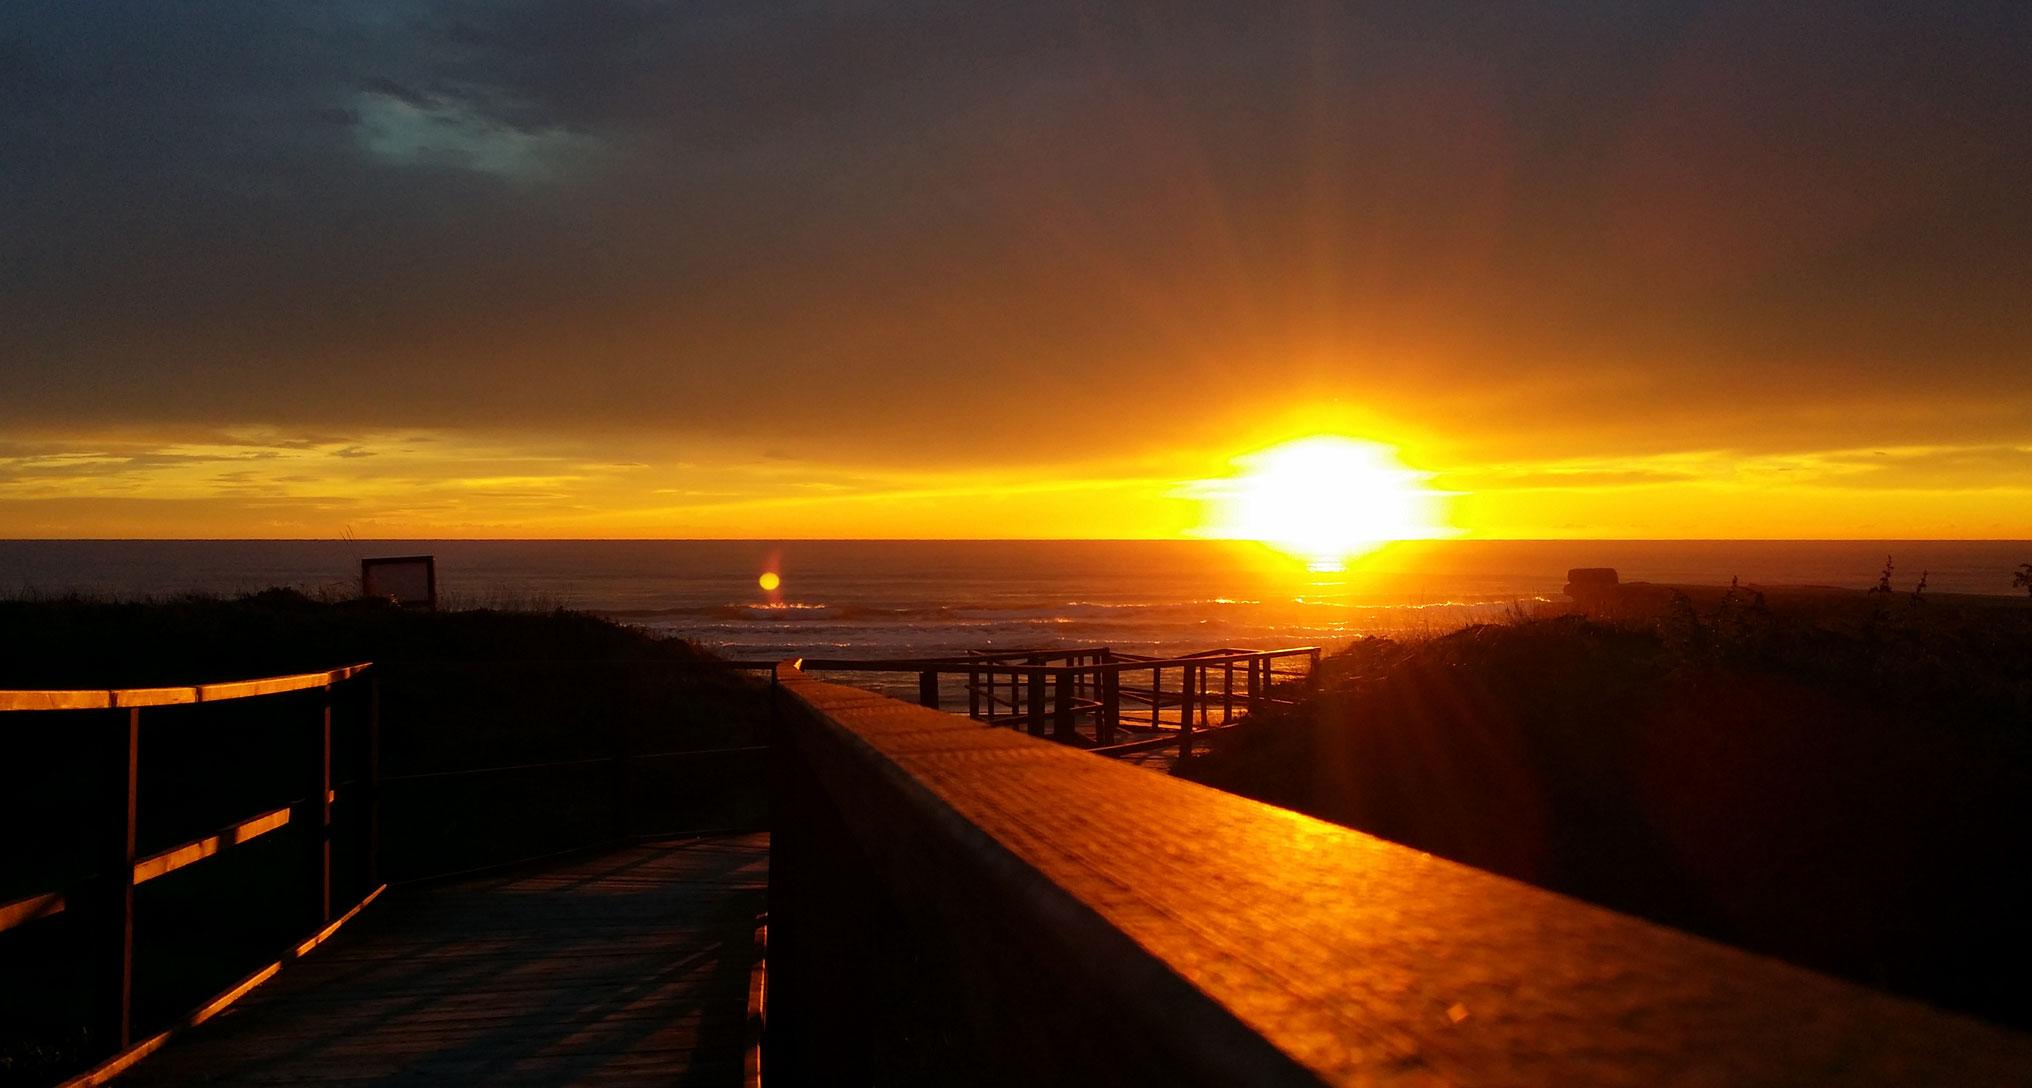 tramonto-dune-di-sabaudia